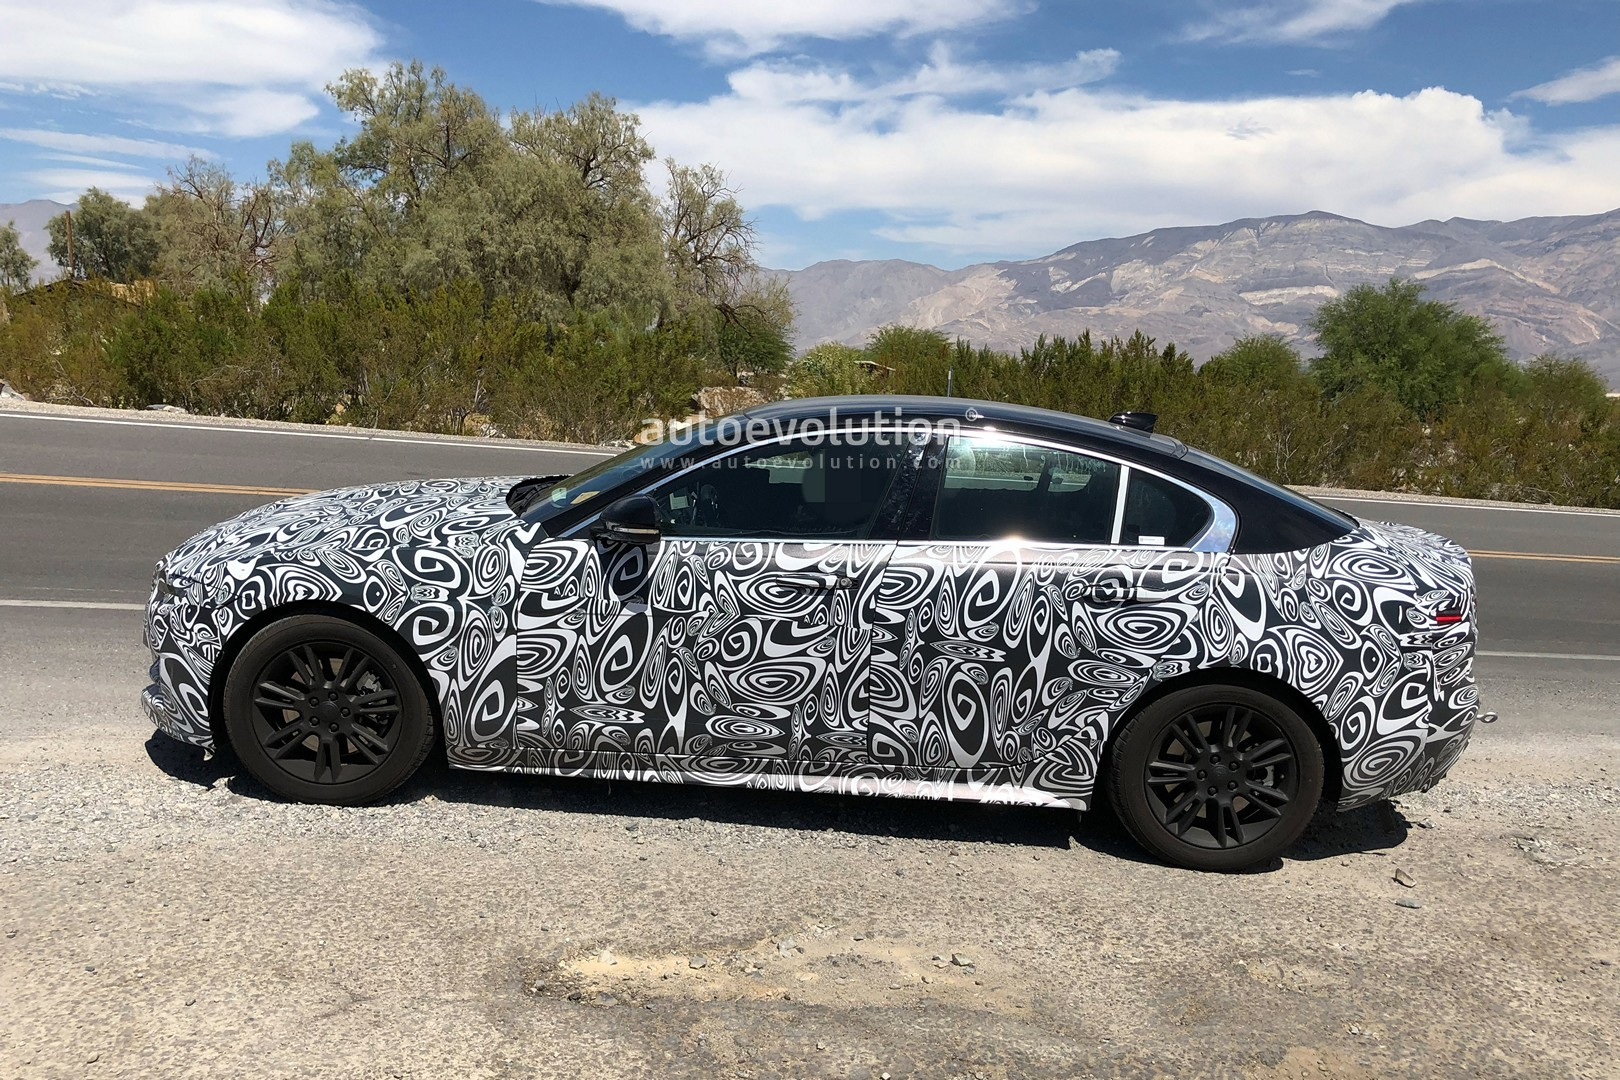 2020 Jaguar Xe Facelift Spied Testing In The Heat